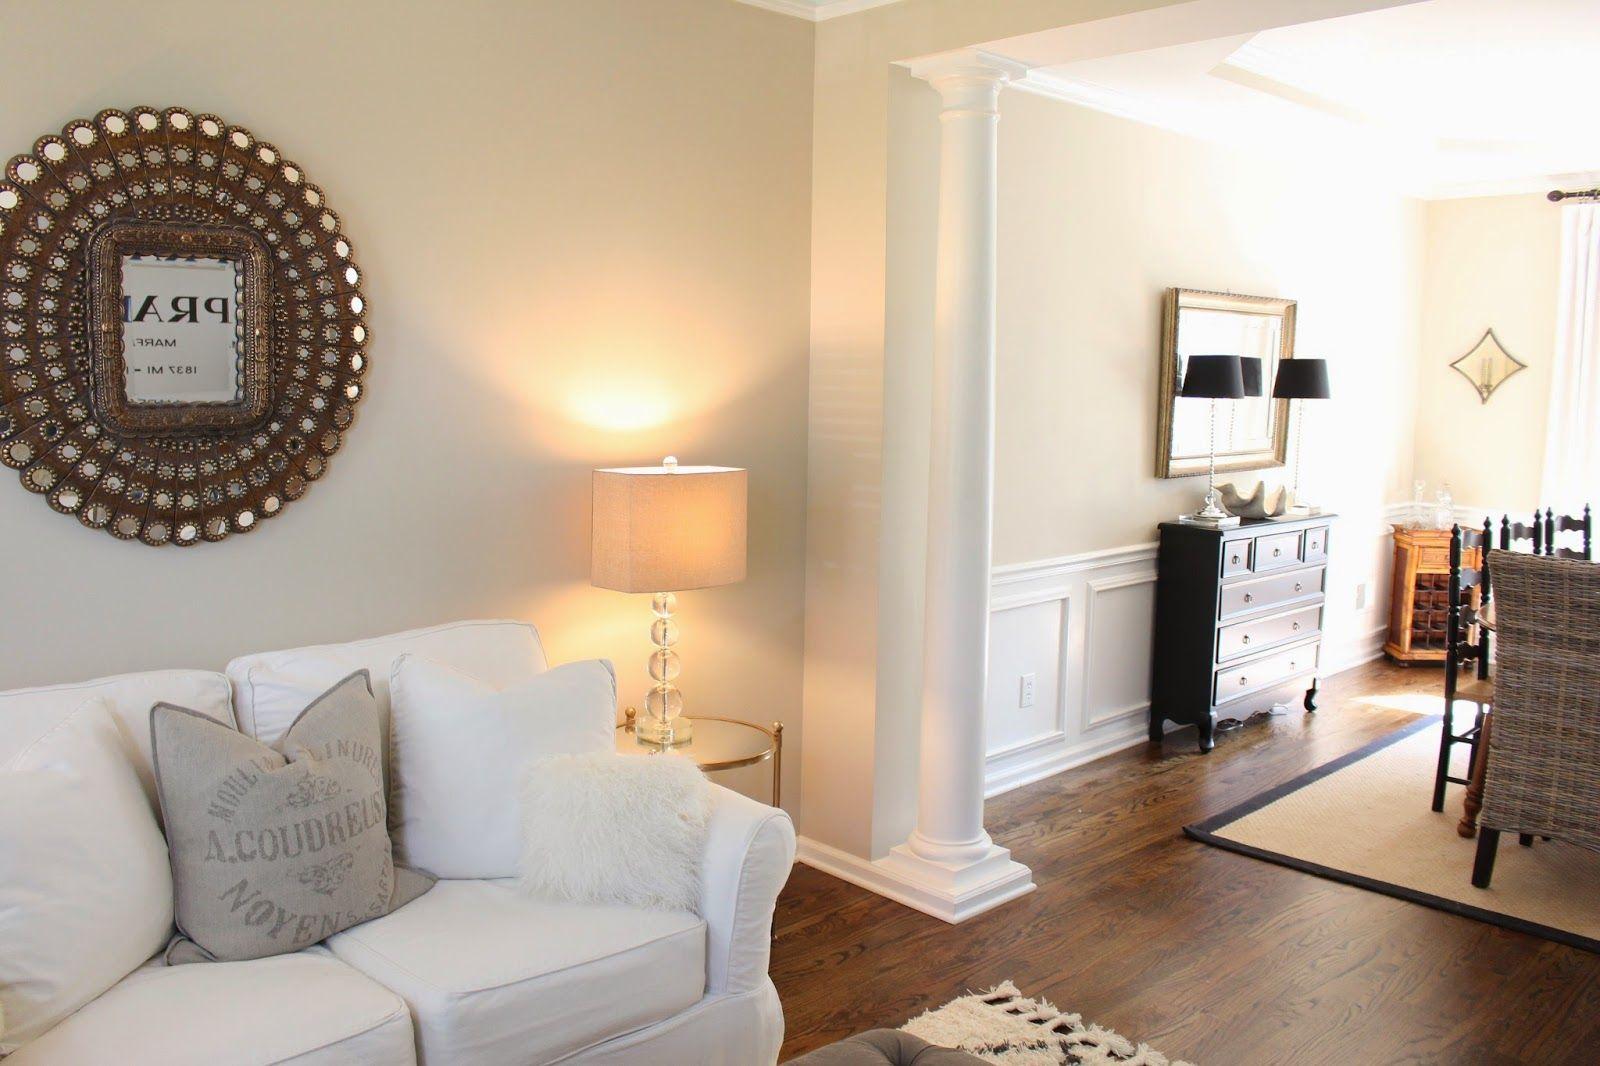 Benjamin moore clay beige kind if a greige dark cream - What type of paint for living room walls ...